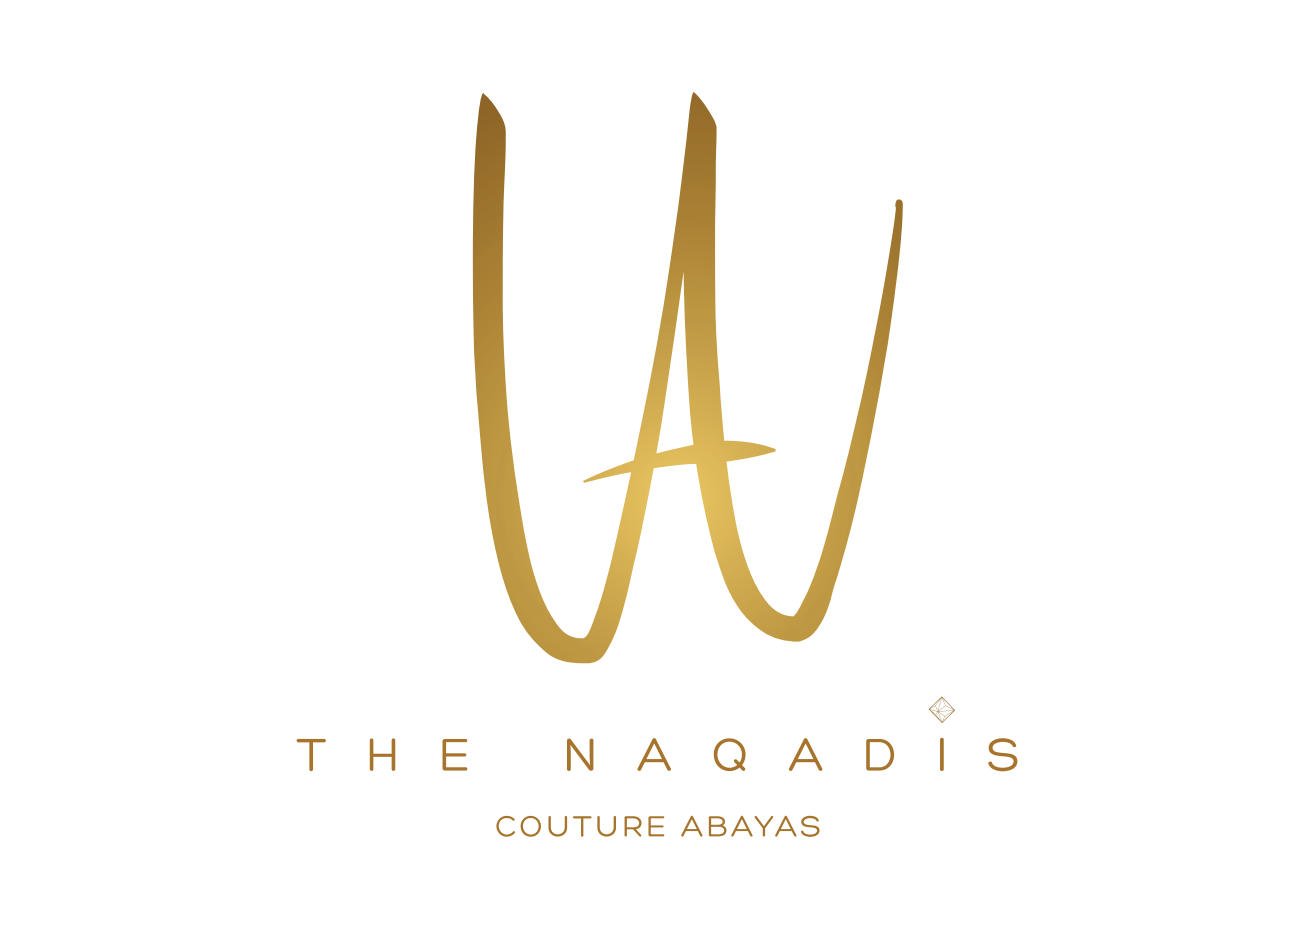 Naqadis